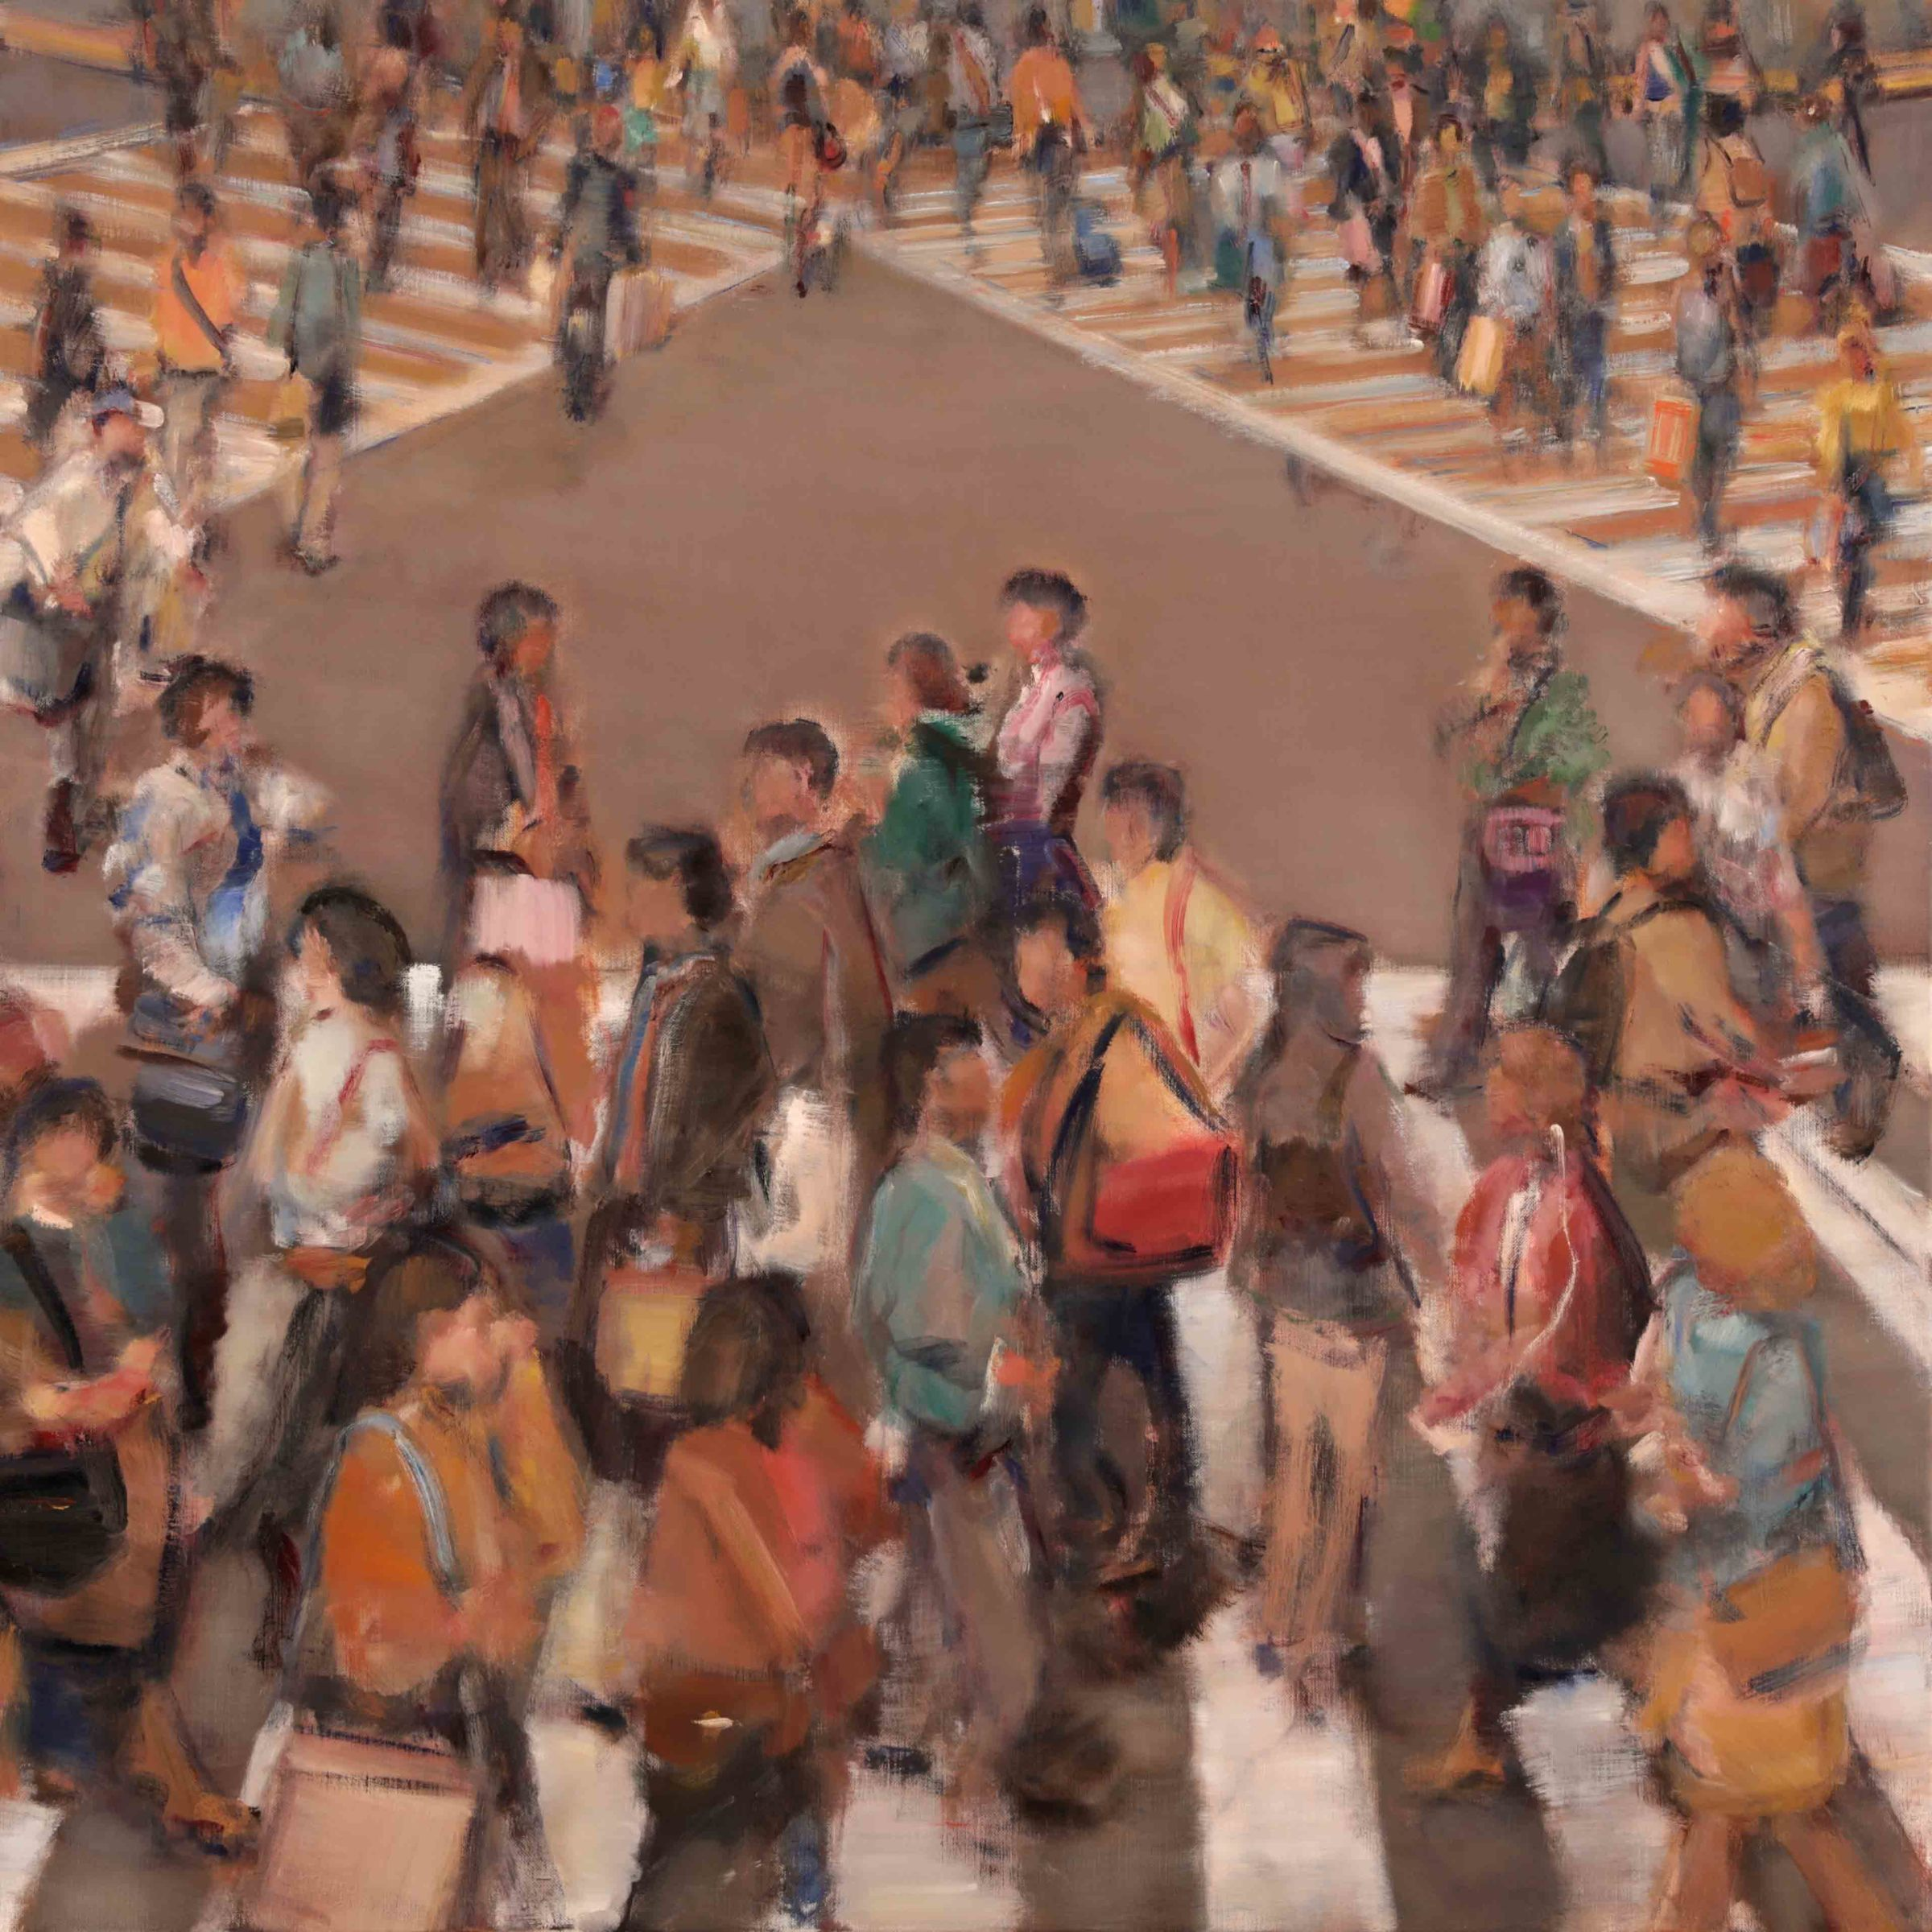 "<span class=""link fancybox-details-link""><a href=""/artists/59-simon-nicholas/works/508-simon-nicholas-crosswalk-v-2019/"">View Detail Page</a></span><div class=""artist""><strong>Simon Nicholas</strong></div> <div class=""title""><em>Crosswalk V</em>, 2019</div> <div class=""medium"">Oil on Linen</div> <div class=""dimensions"">47 x 47 inches<br /> SOLD</div>"